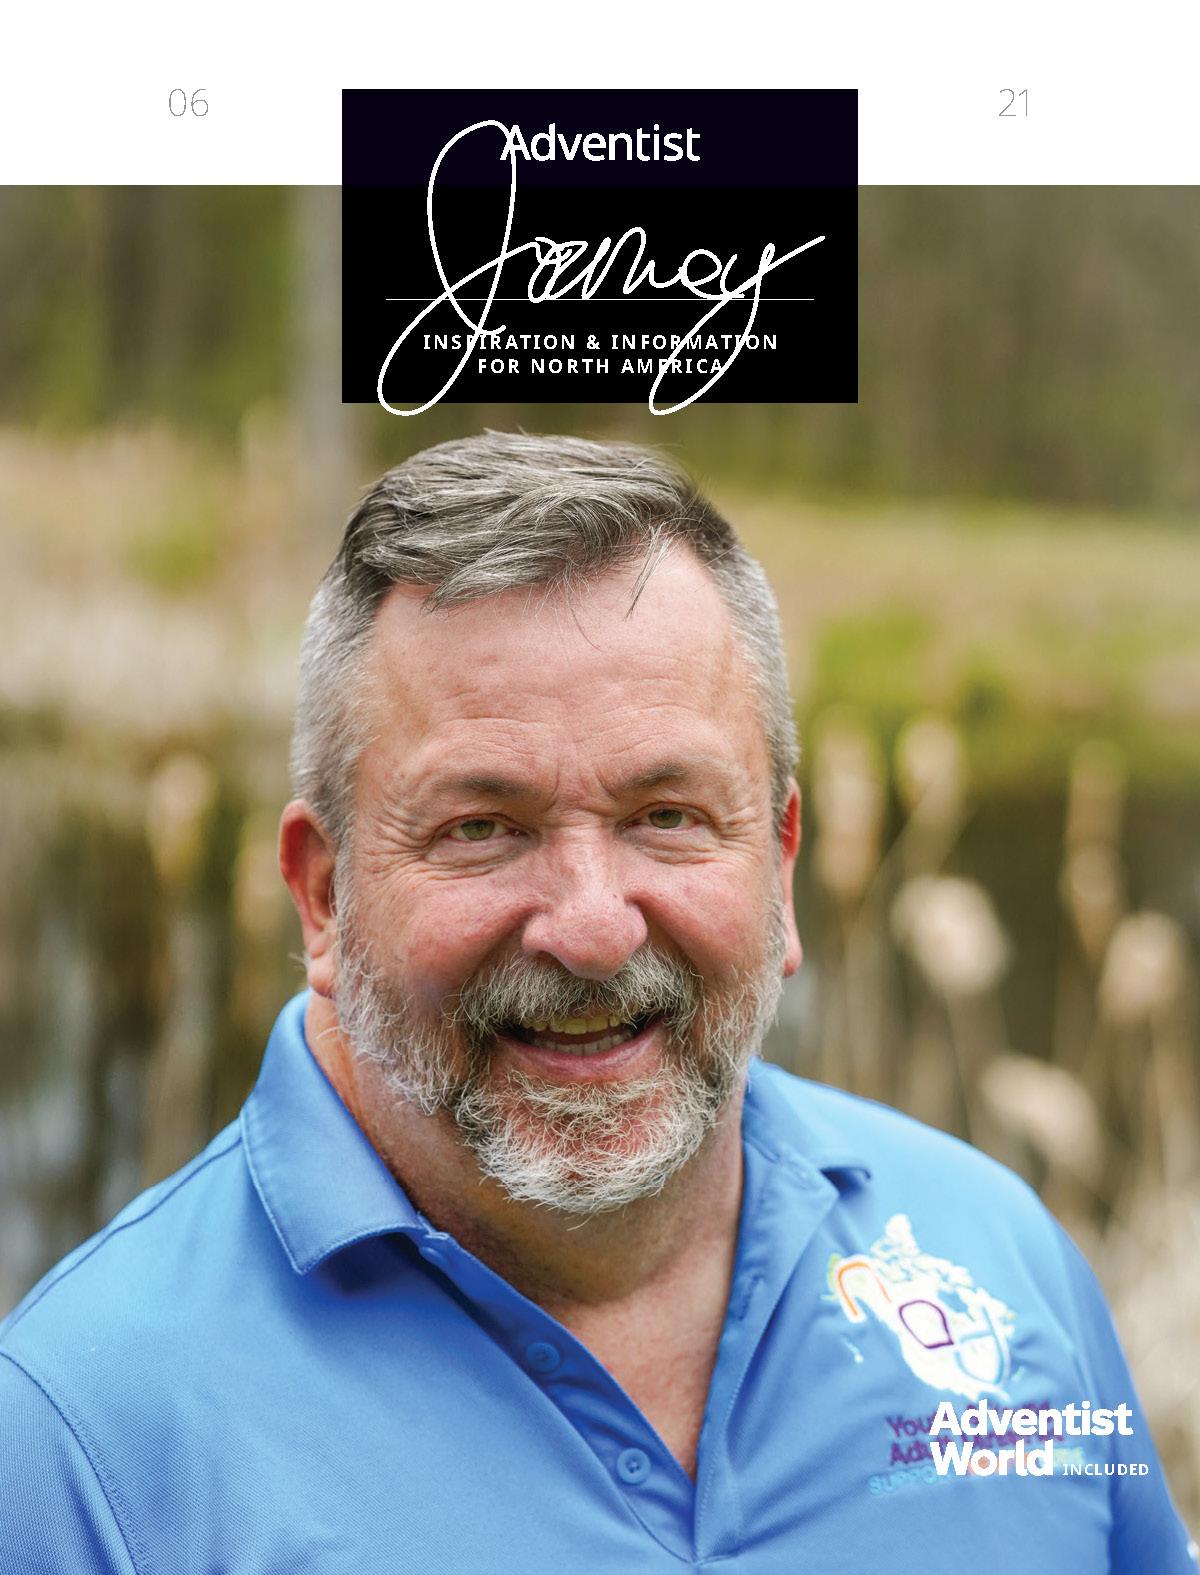 Adventist Journey magazine cover featuring Glen Milam